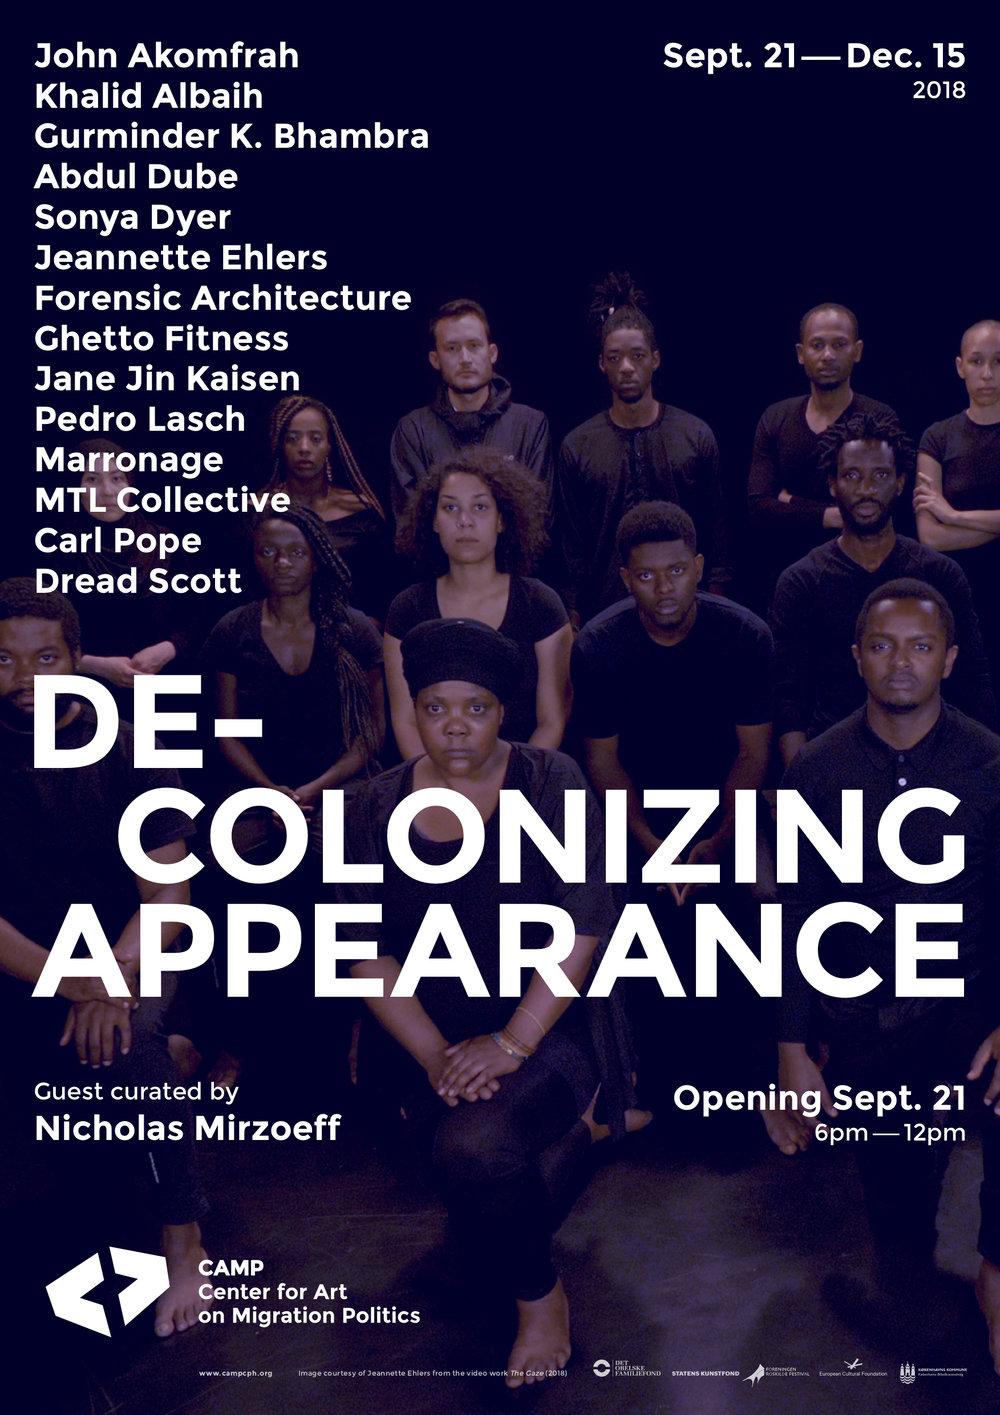 DecolonizingAppearance-poster.jpg